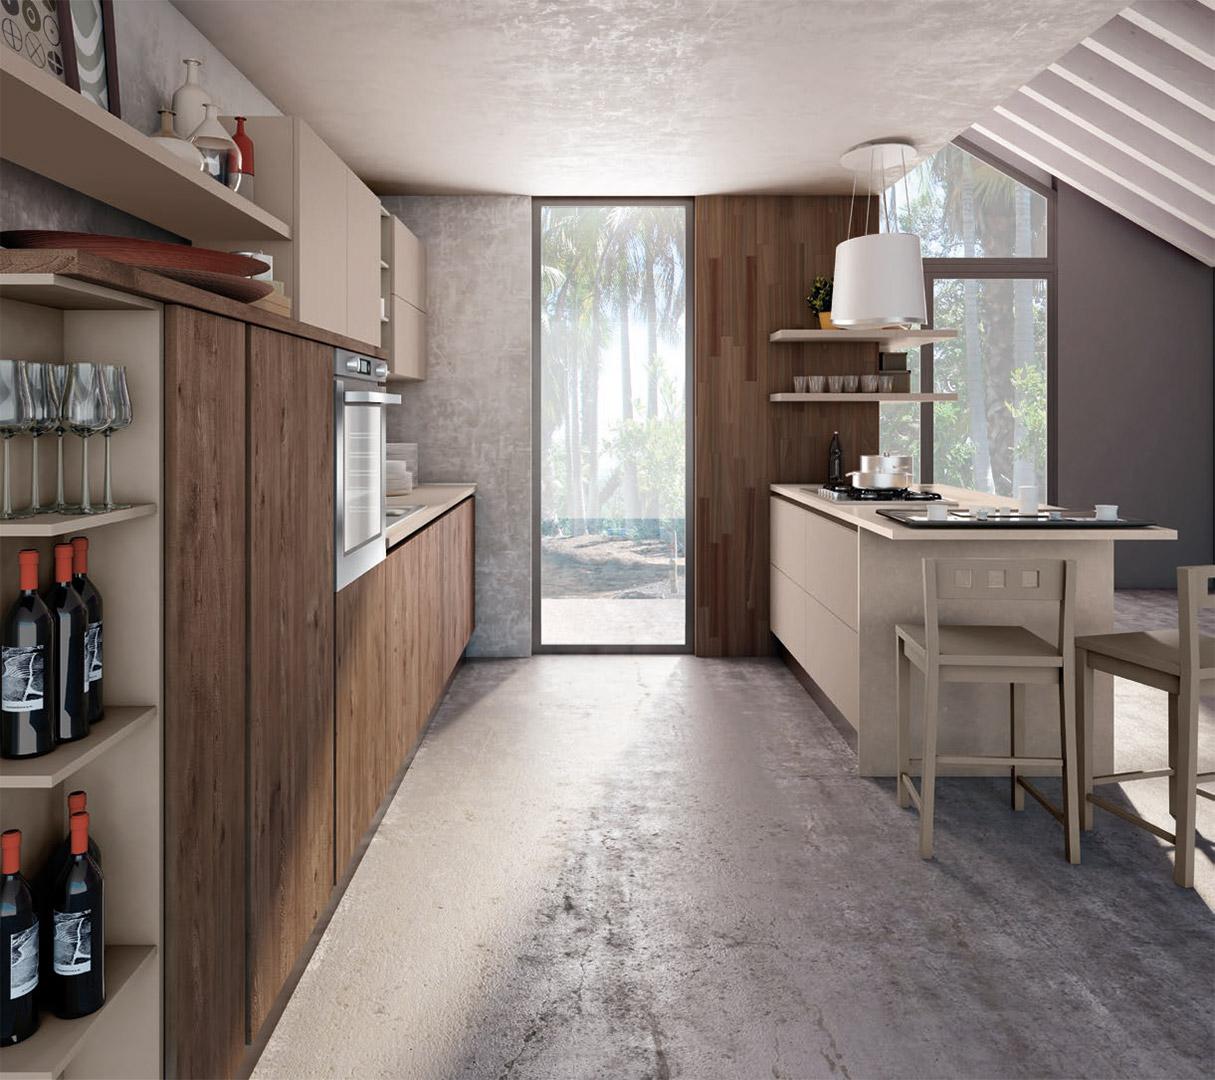 Cucina Kyra Creo Prezzo cucina moderna lube - kyra creo kitchens